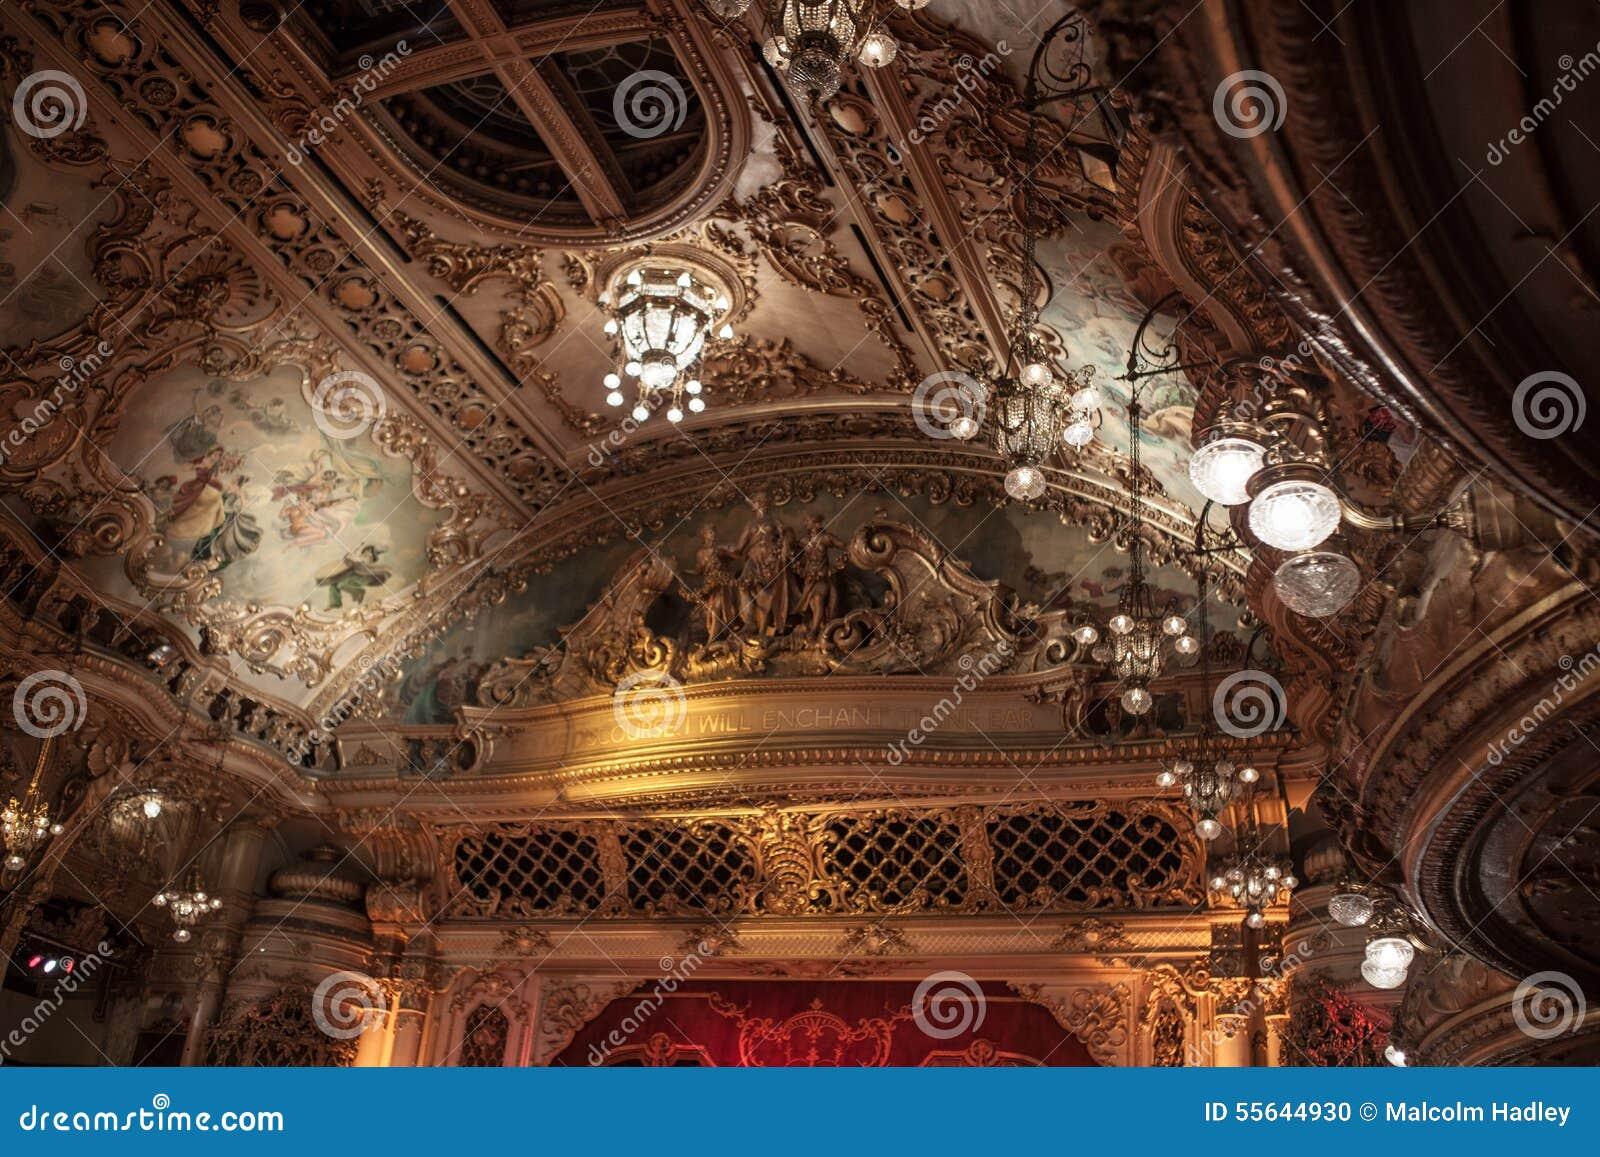 Ceiling Lights Blackpool : Ornate ceiling at blackpool s tower ballroom stock photo